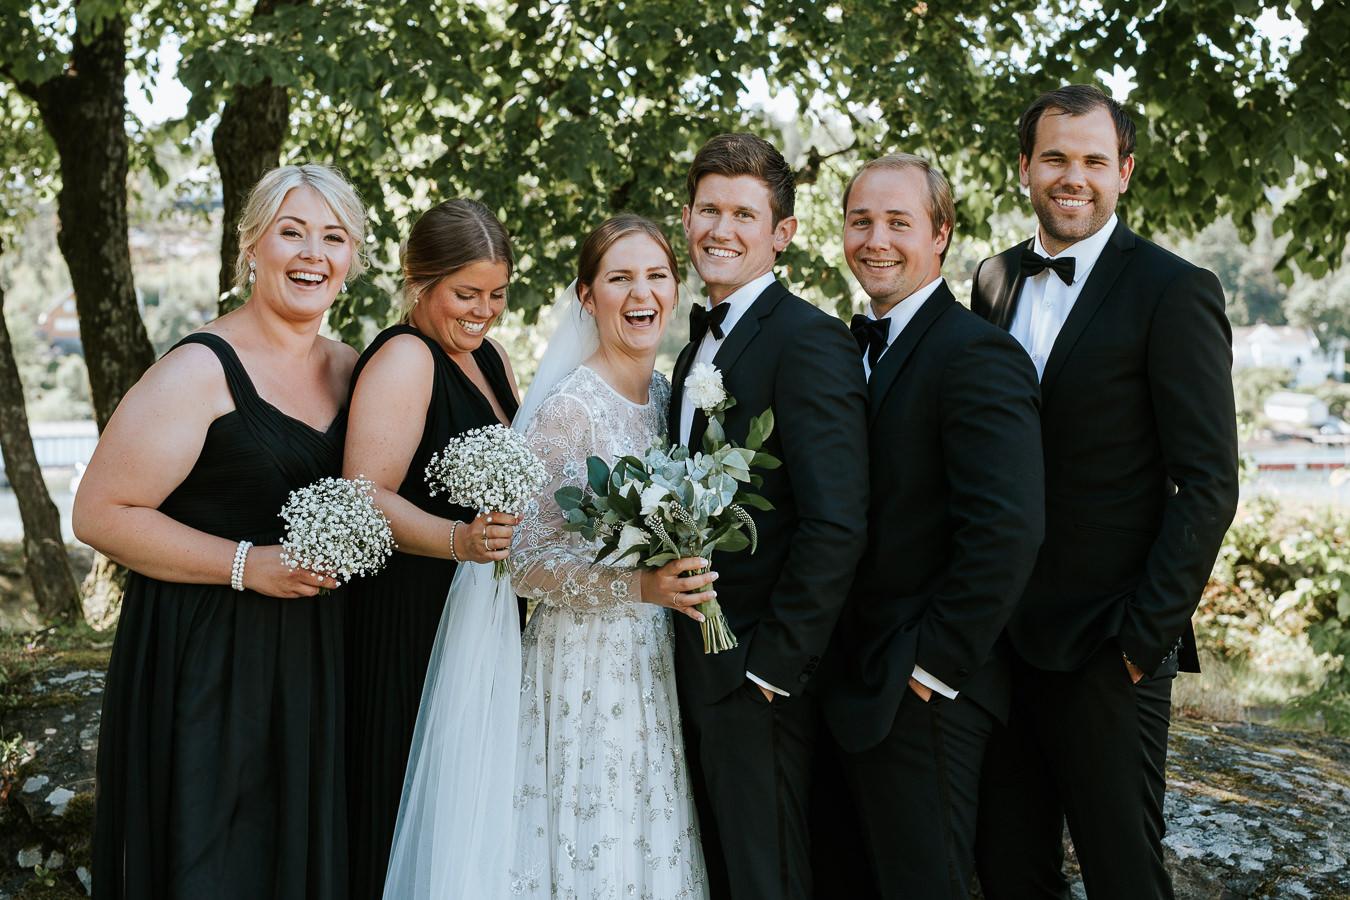 Bryllup-Hellviktangen-fotograf-tvedt-133.jpg